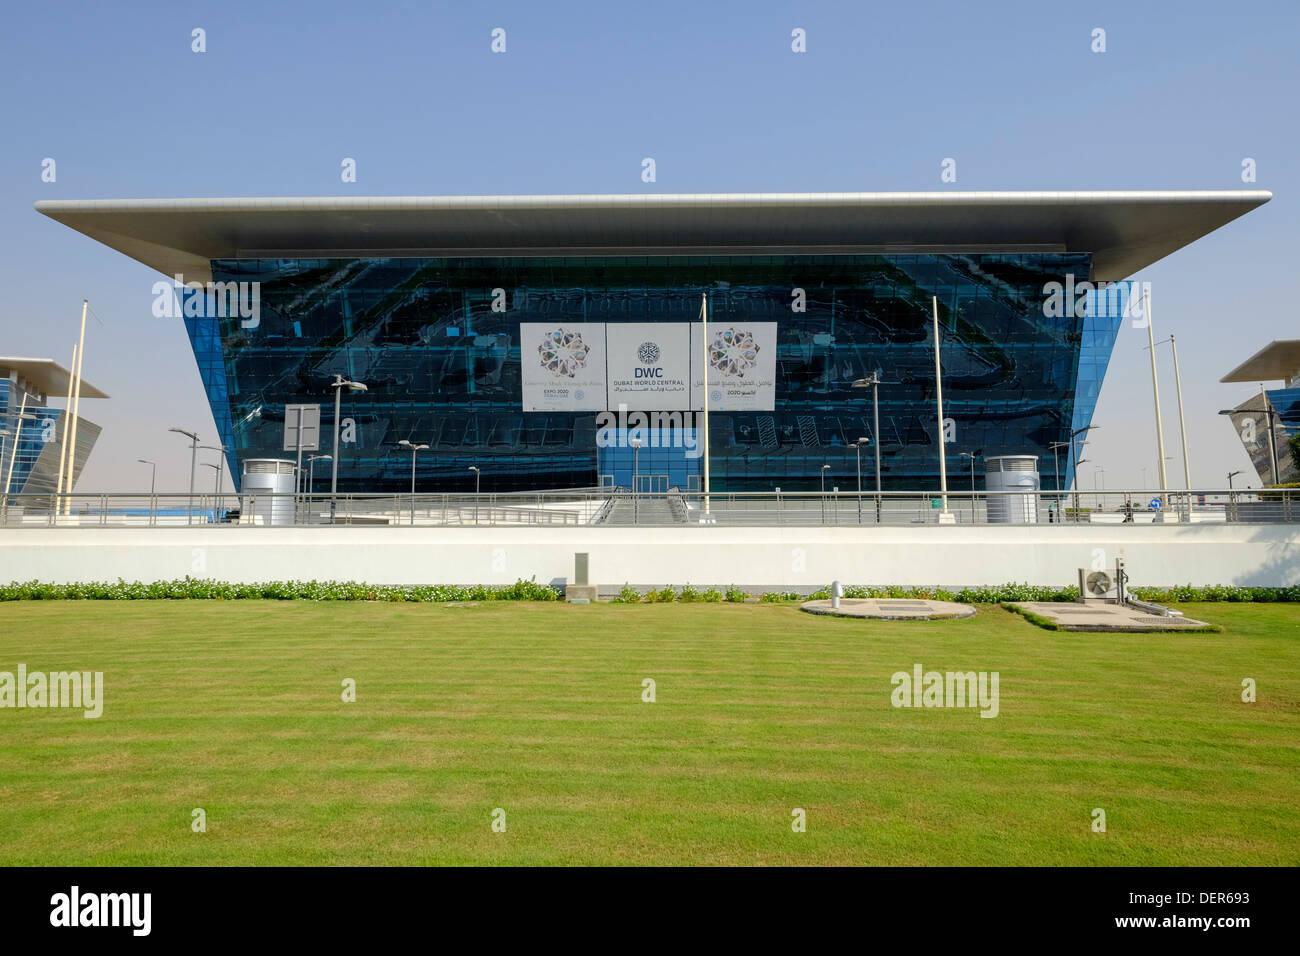 Modern office buildings at Dubai World Central logistics hub in Jebel Ali Dubai United Arab Emirates - Stock Image